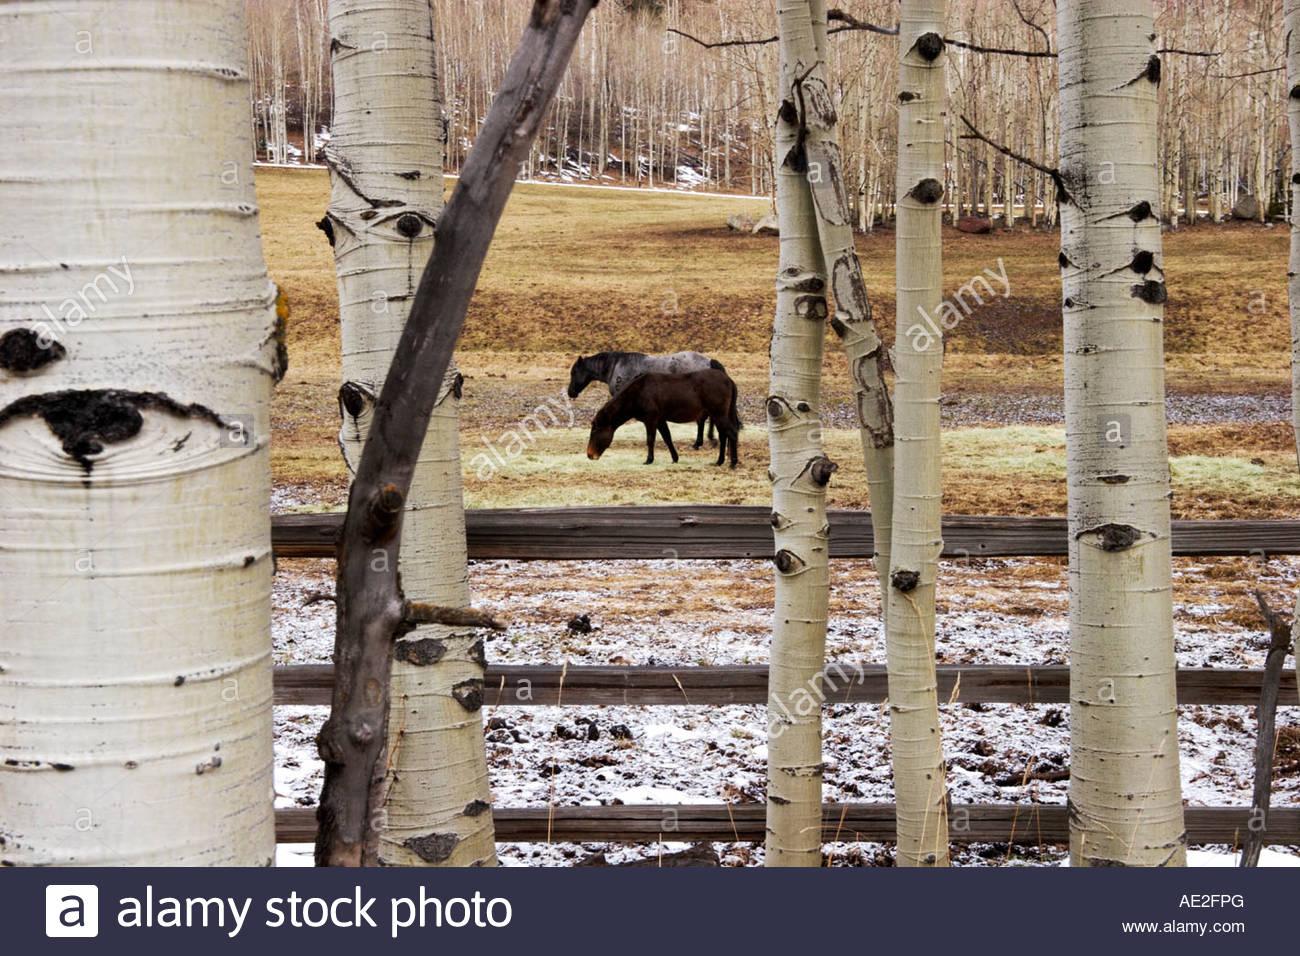 Belgian Draft Horses in a Meadow Framed by Aspen Trees Aspen Colorado - Stock Image